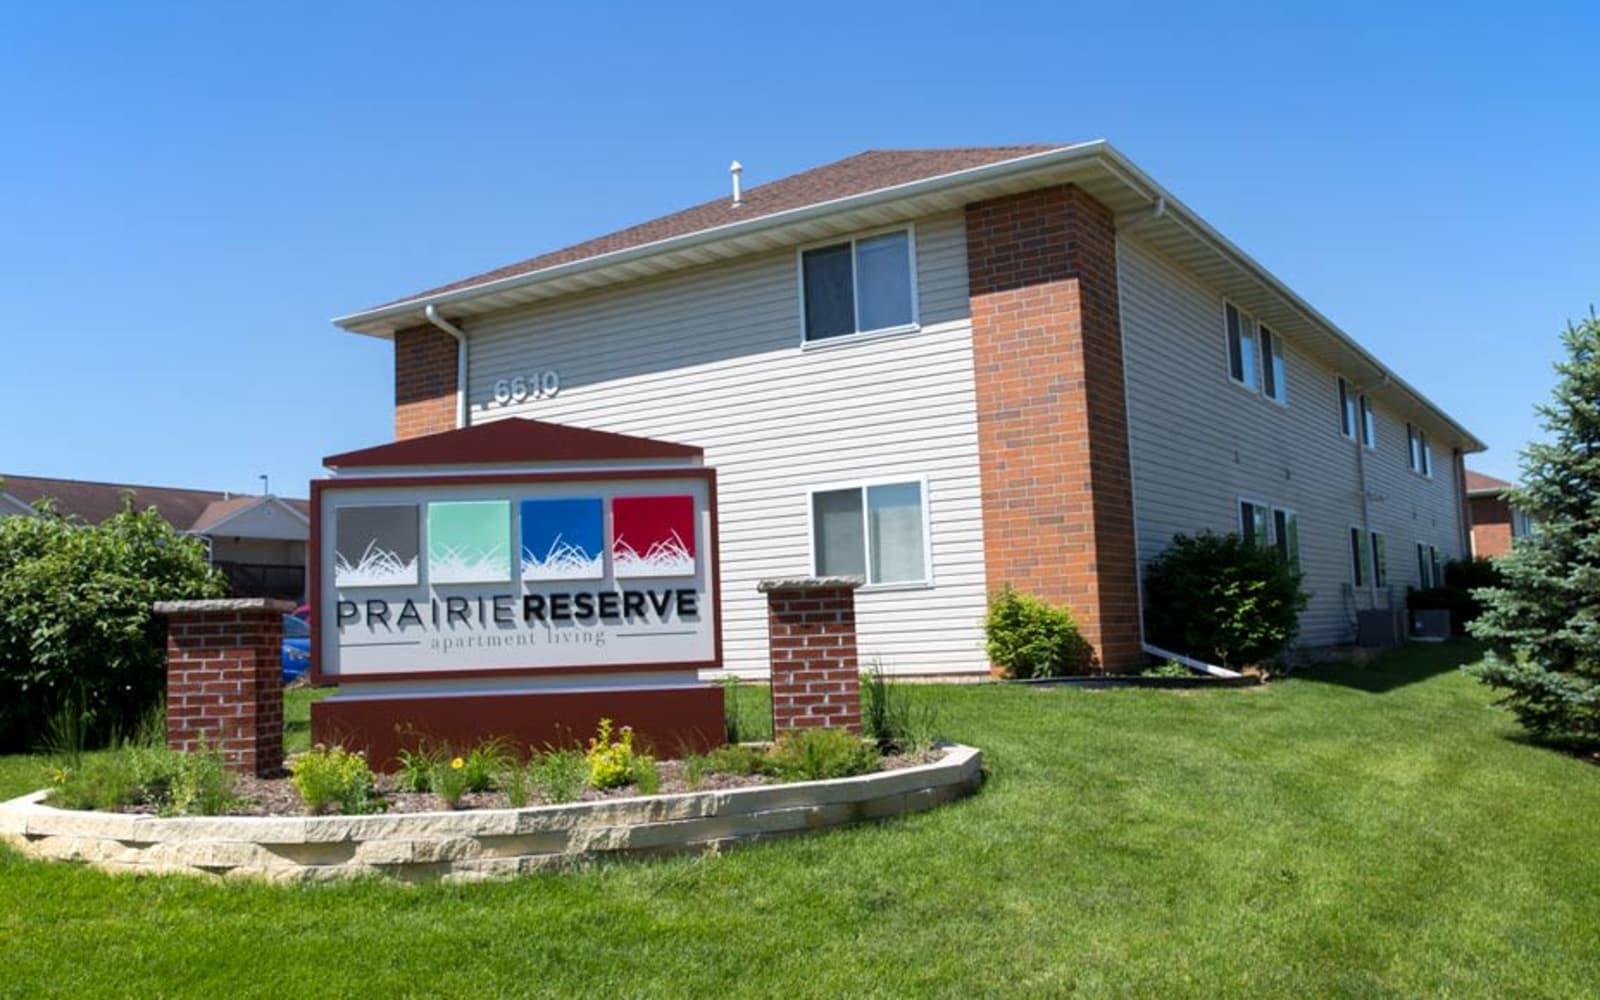 Branding and signage at Prairie Reserve in Cedar Rapids, Iowa